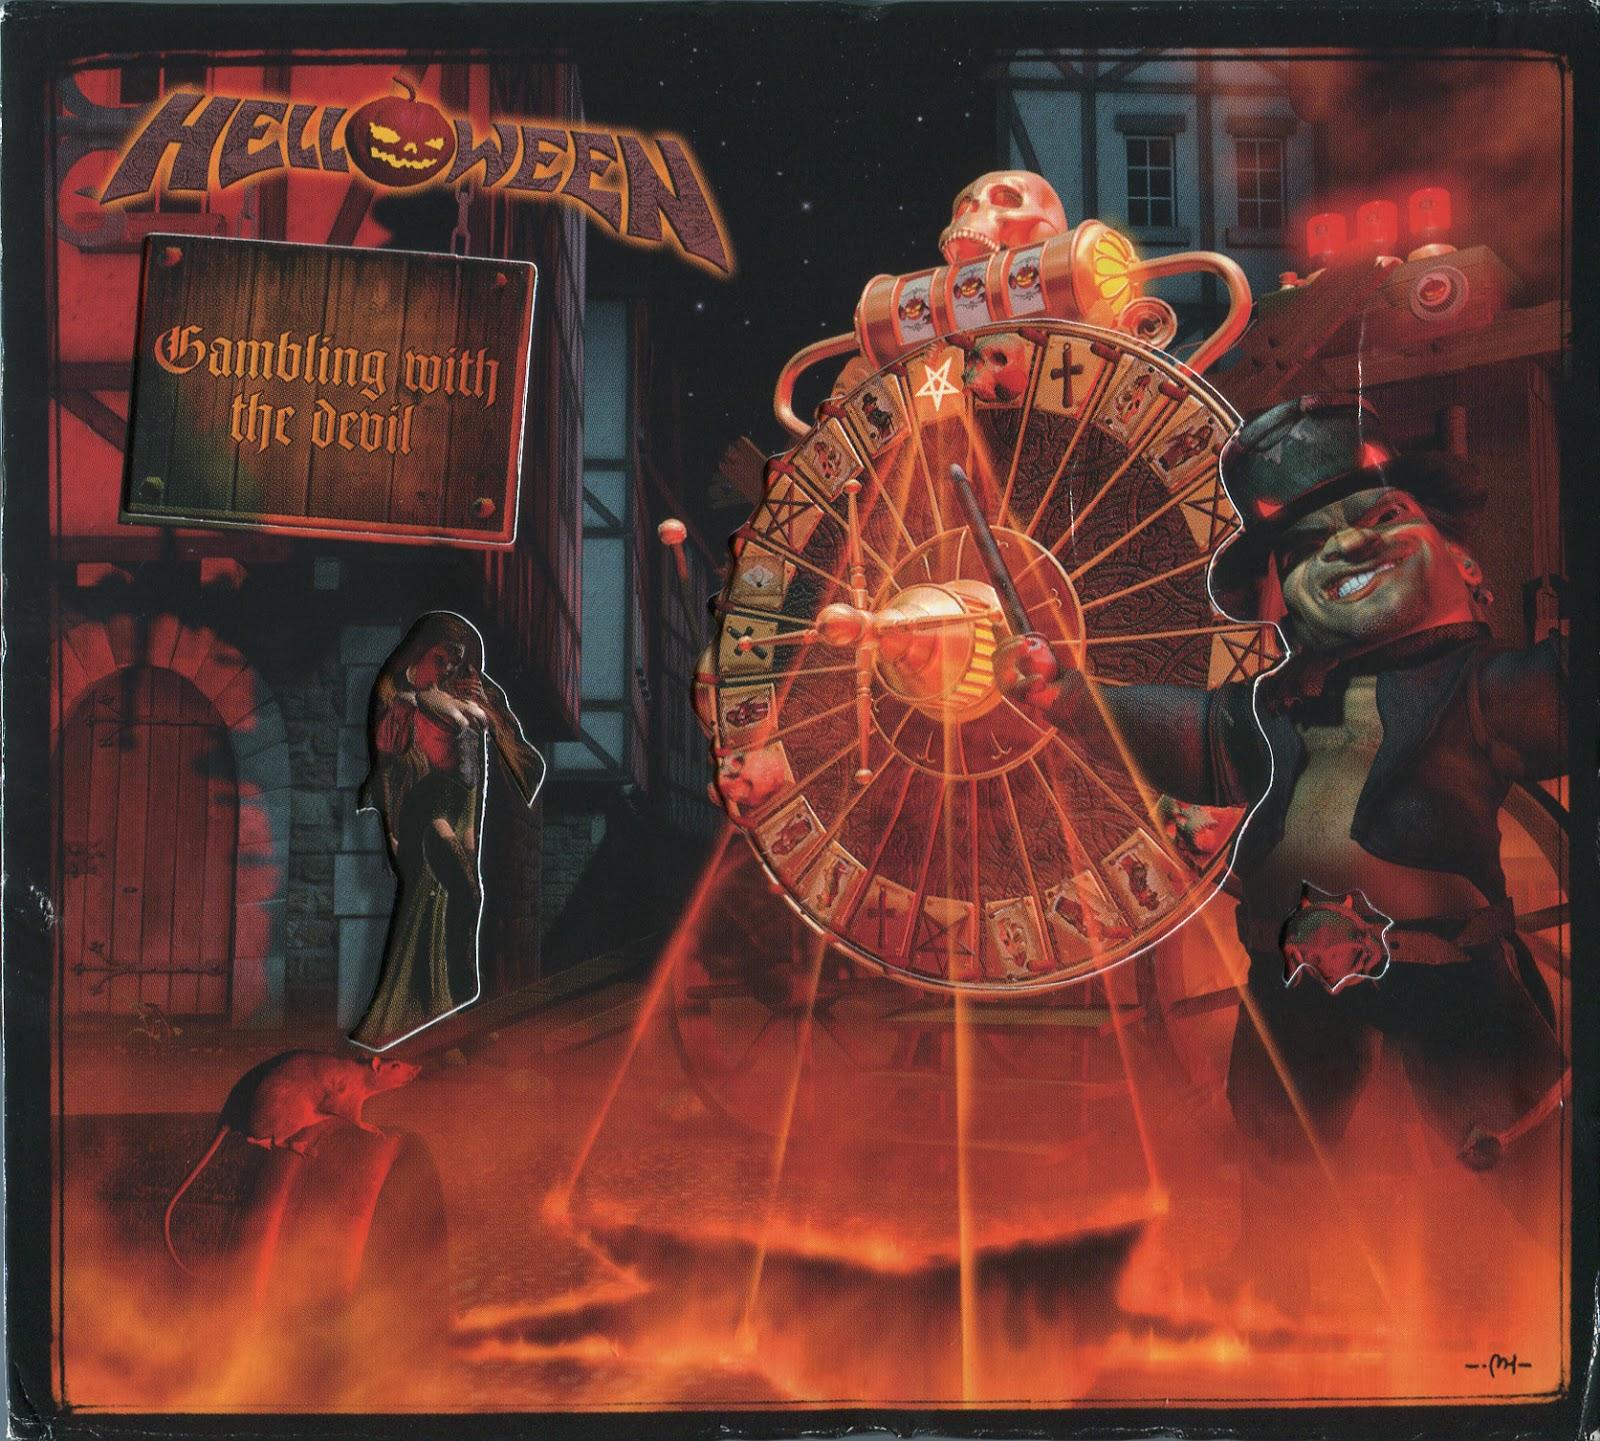 helloween discography 320